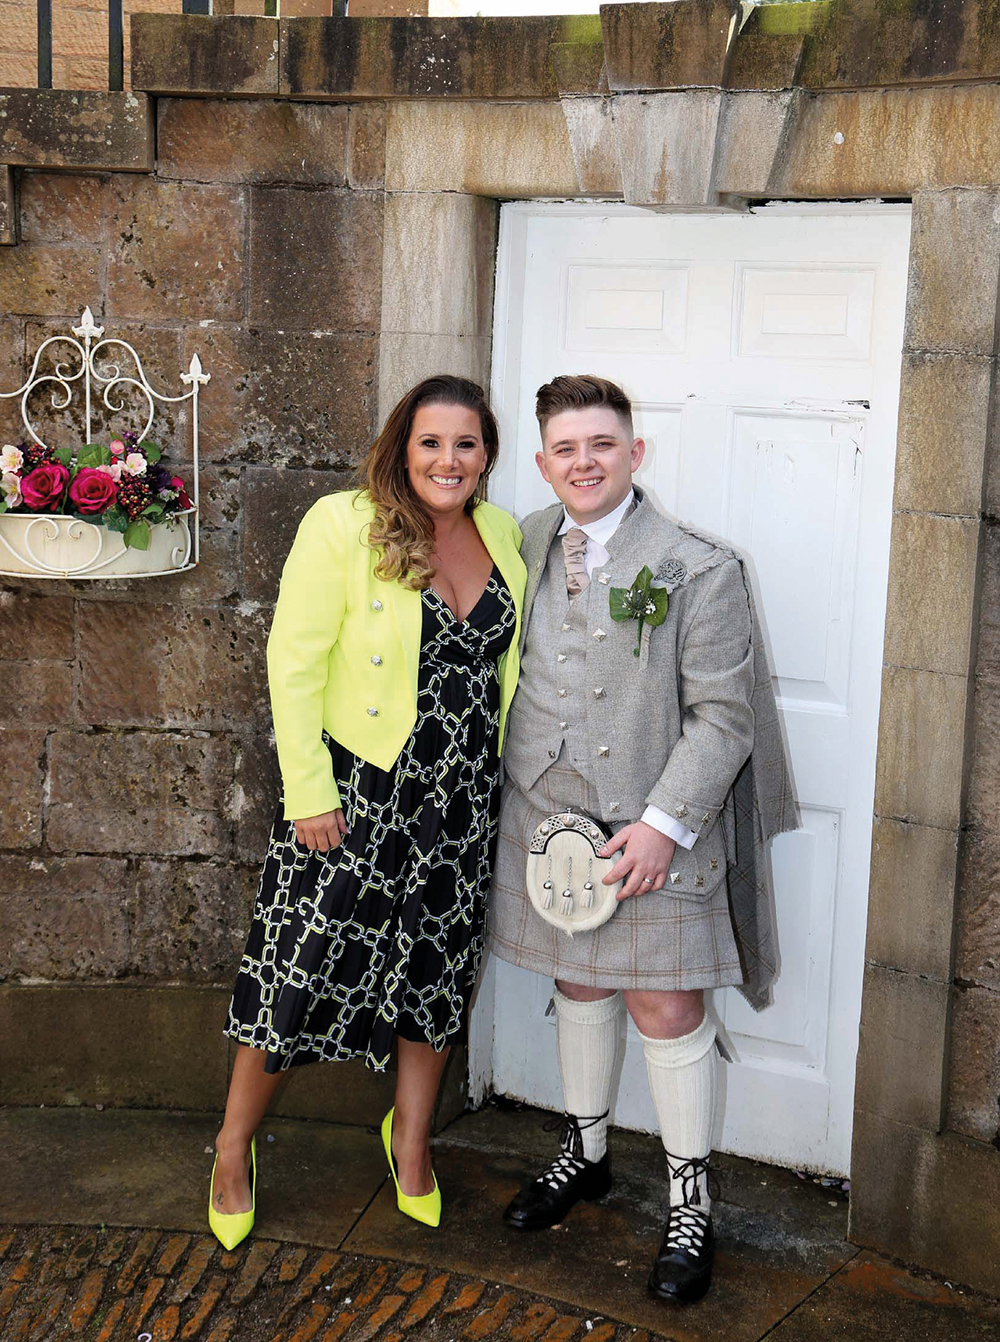 Ryan Mimiec Photography - Chatelherault wedding - Nicky McDonald reception